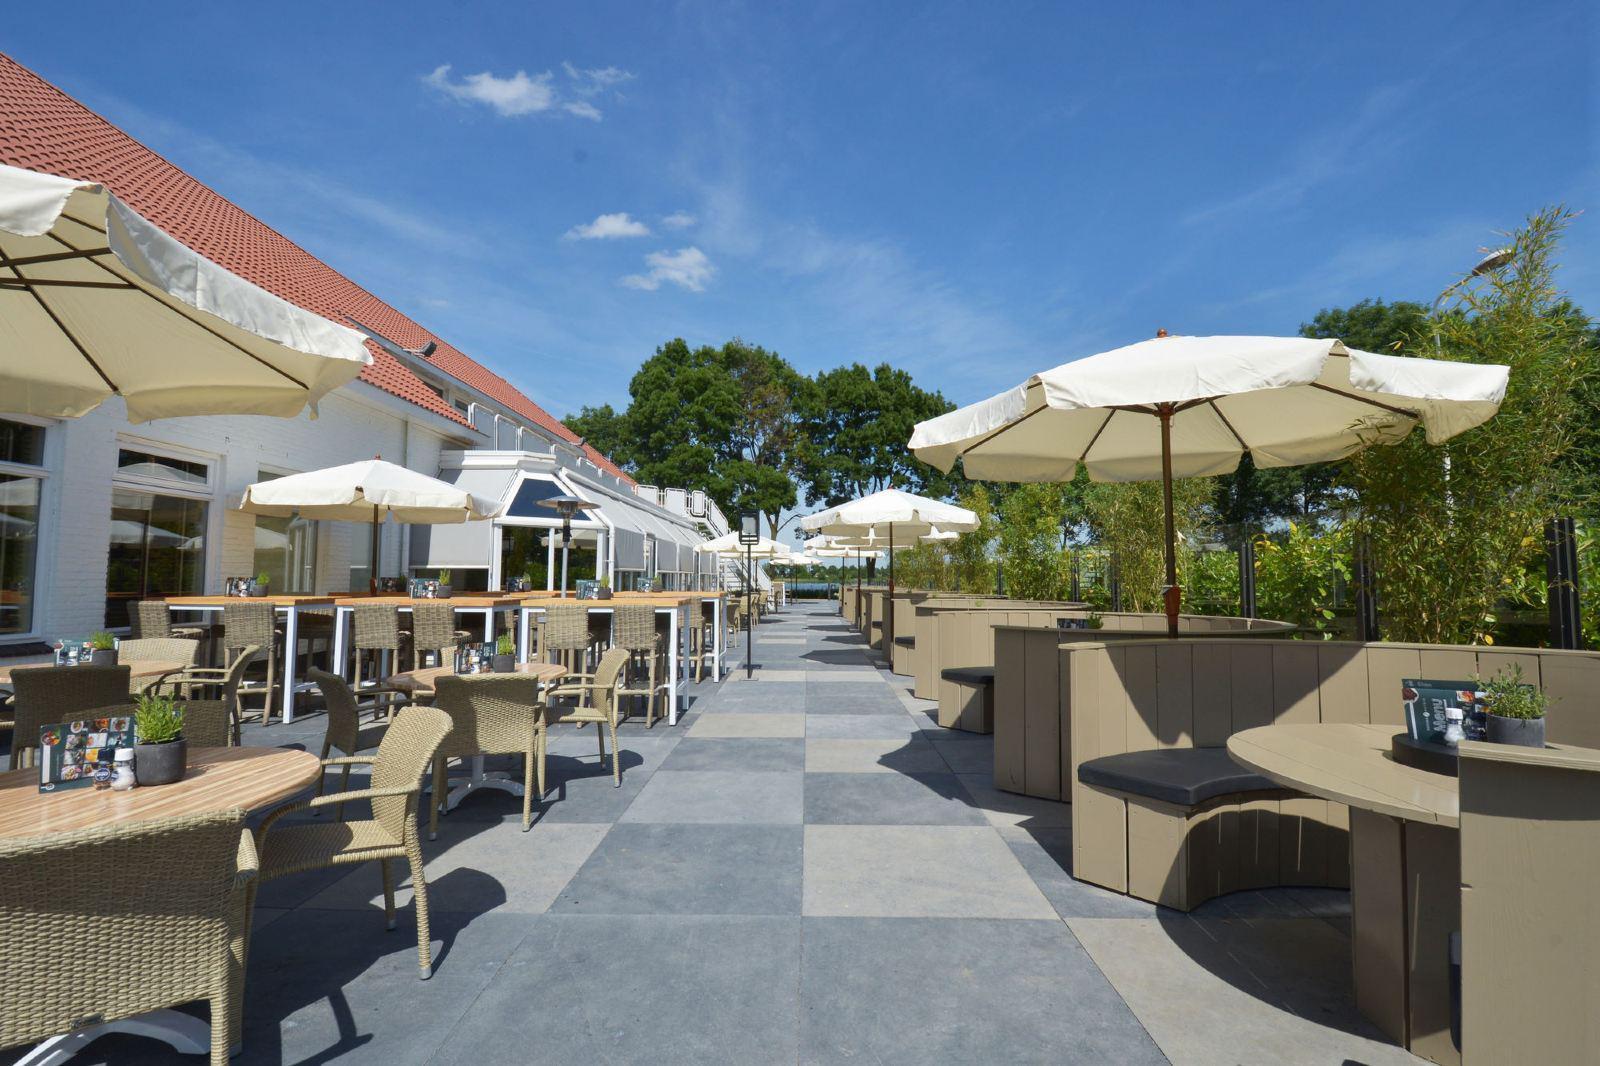 Fletcher Hotel Restaurant S Hertogenbosch Rosmalen Hotels Skyscanner